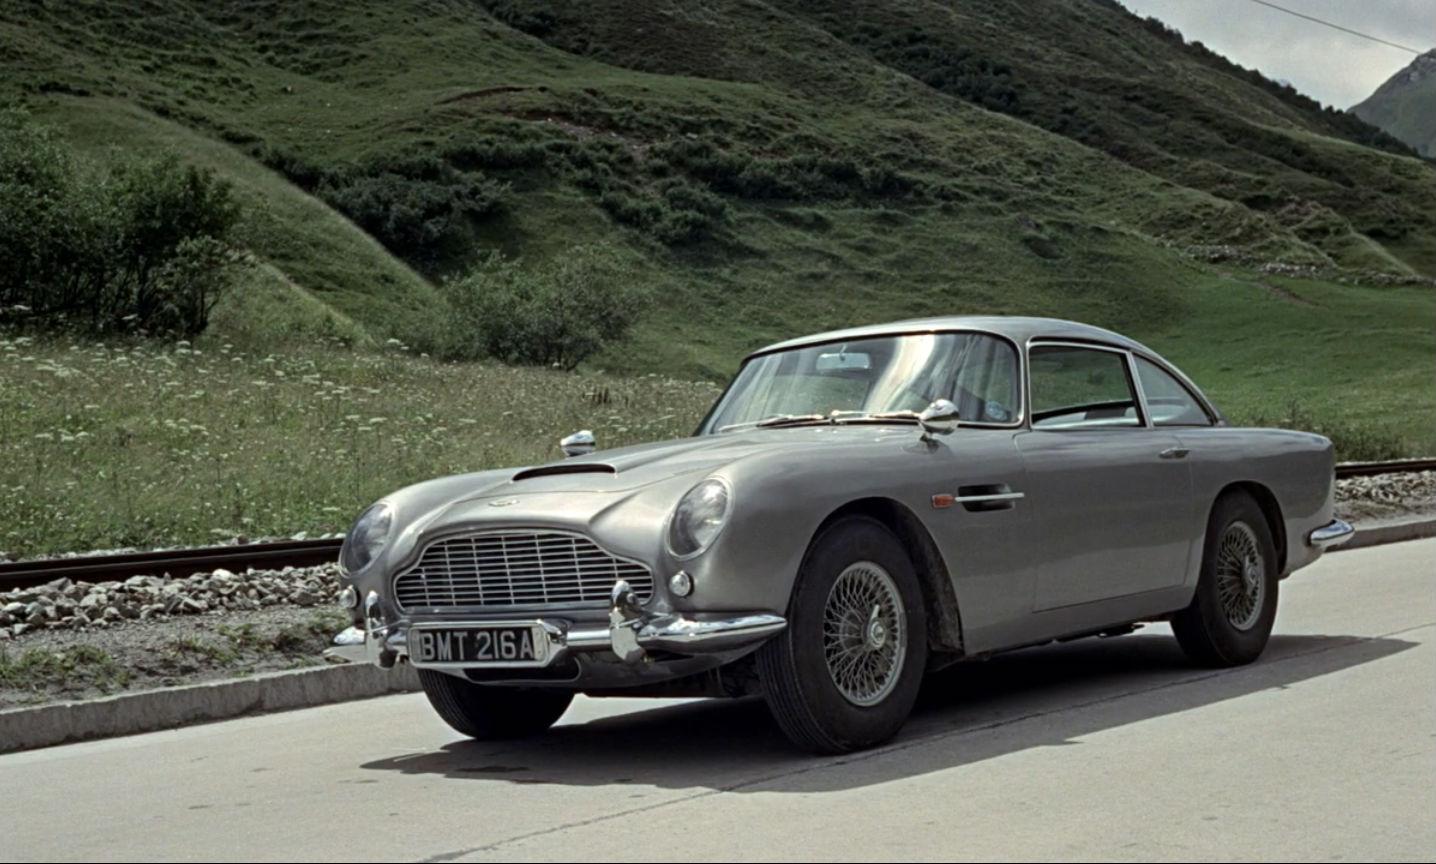 Aston Martin DB5 1964 Goldfinger